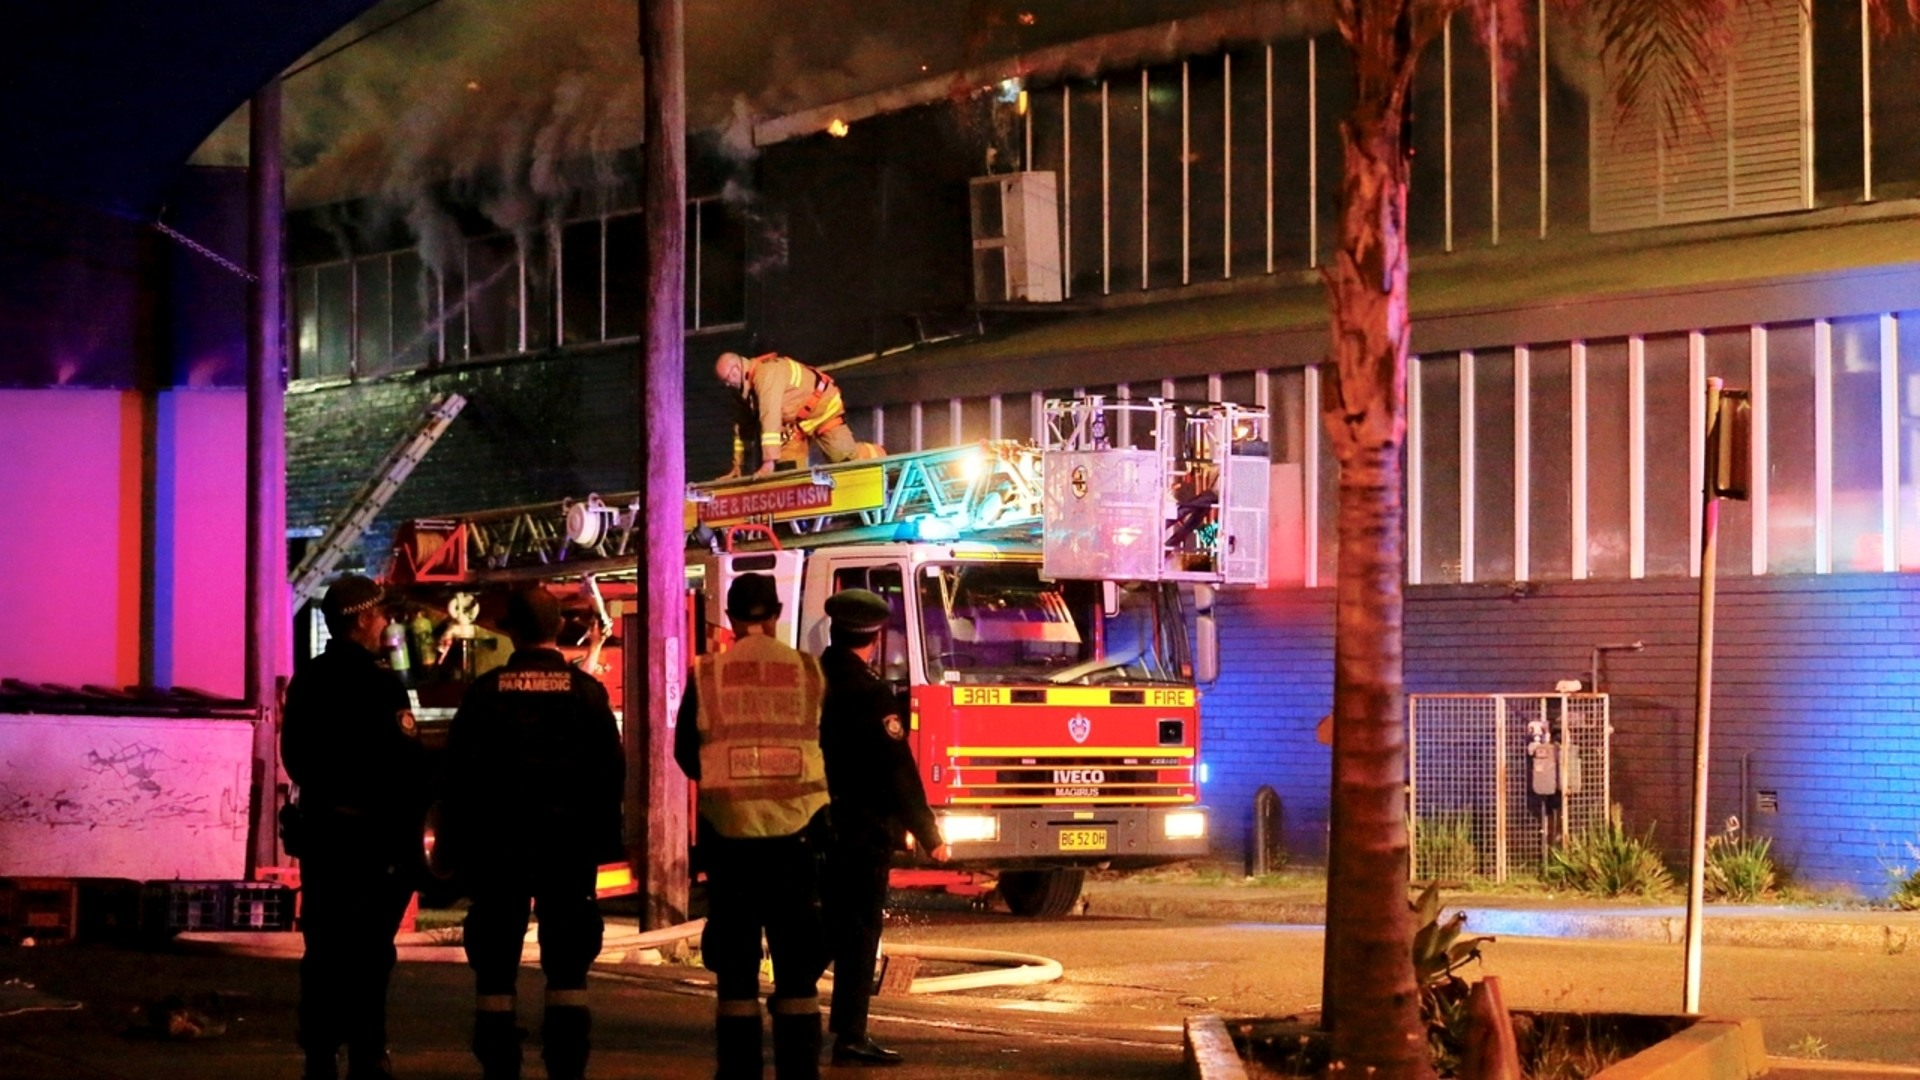 sydney car park fire to cause traffic chaos | sky news australia